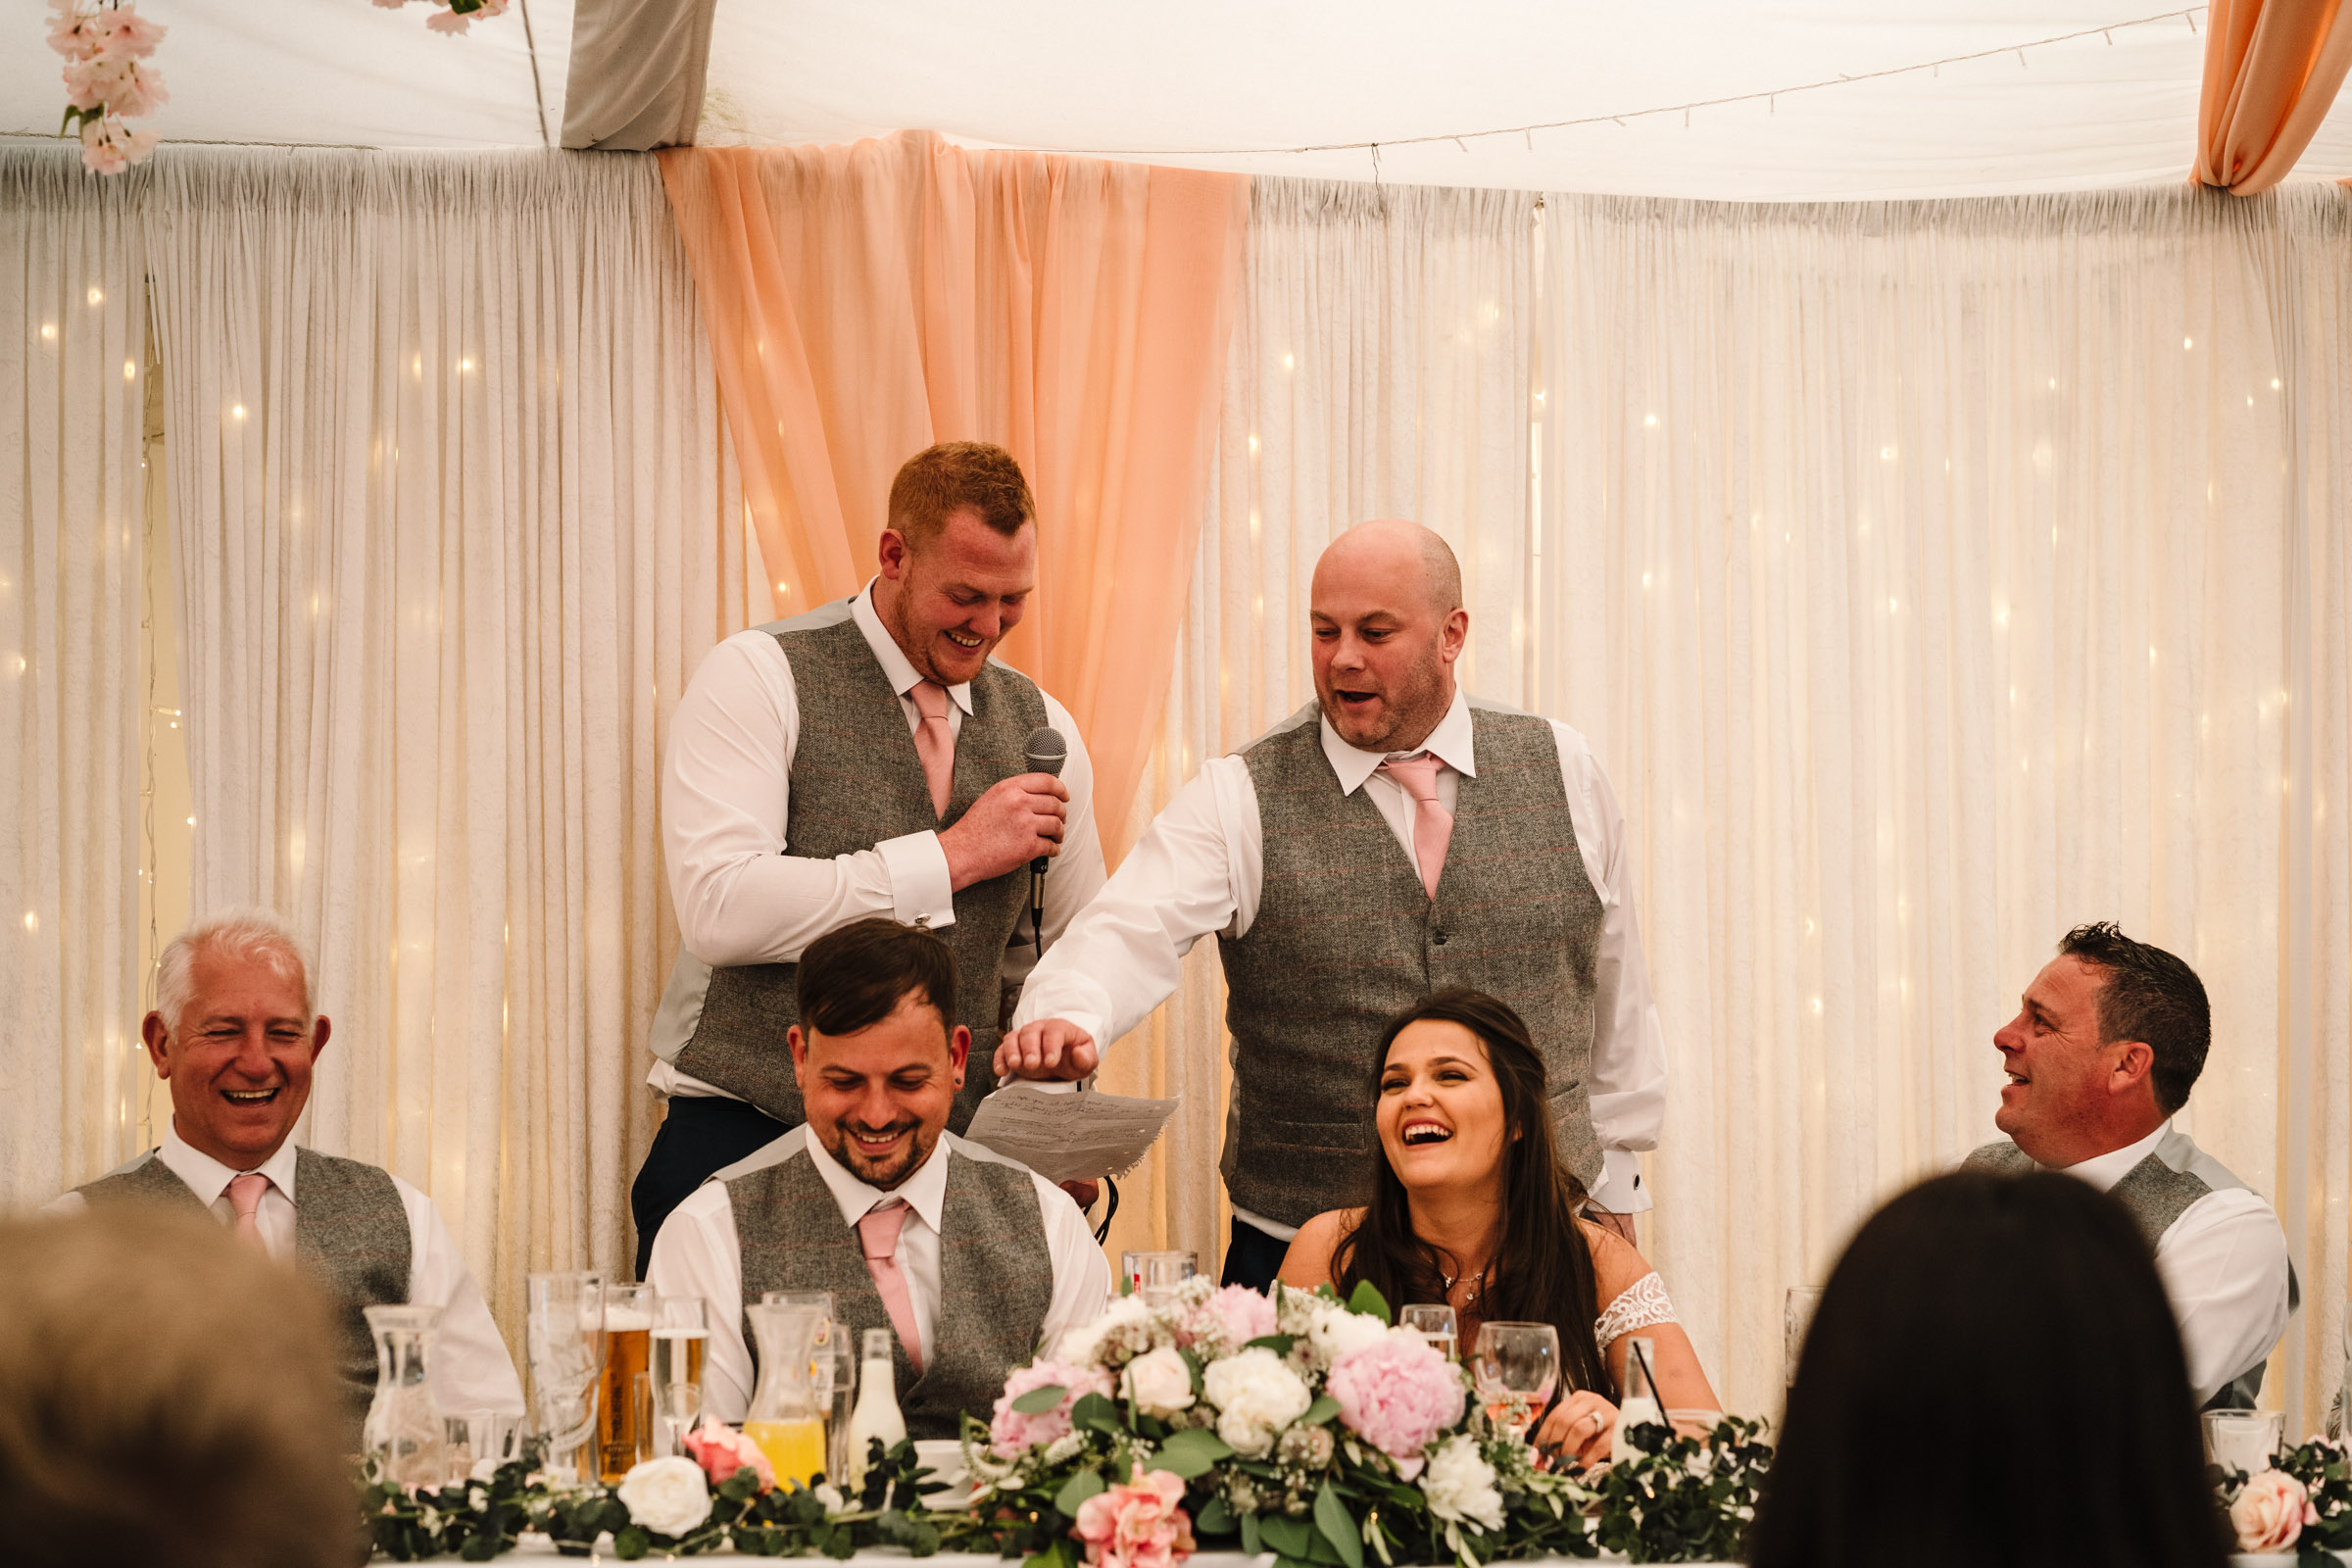 Best men giving speech during wedding breakfast